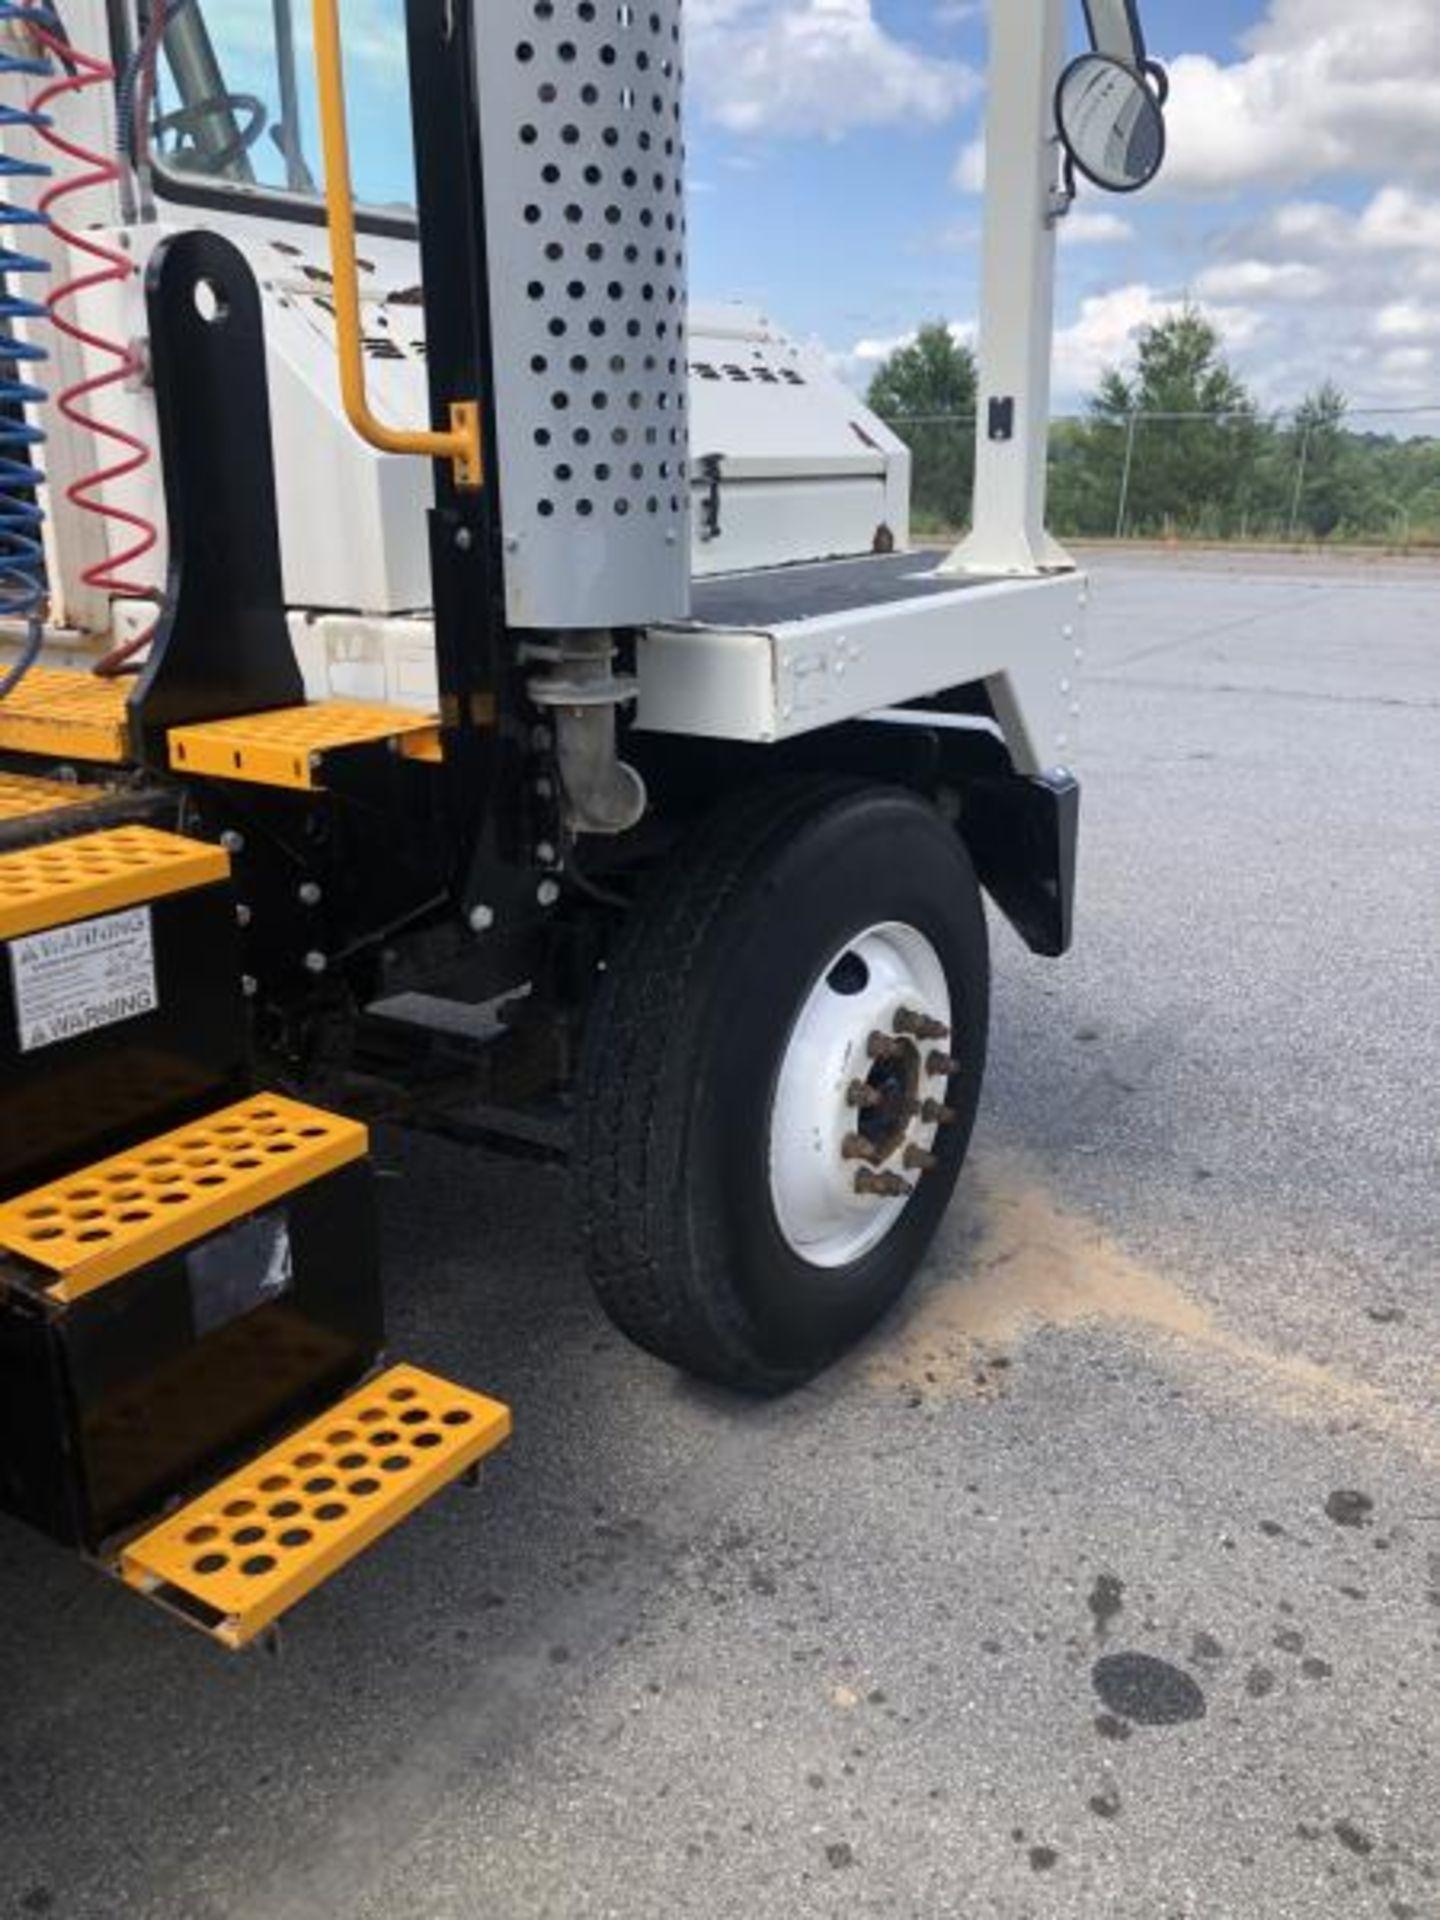 2015 Kalmar Ottawa 4x2 Yard Truck , SN: 338842 1,308.2 Hours, 937 Miles - Image 3 of 27